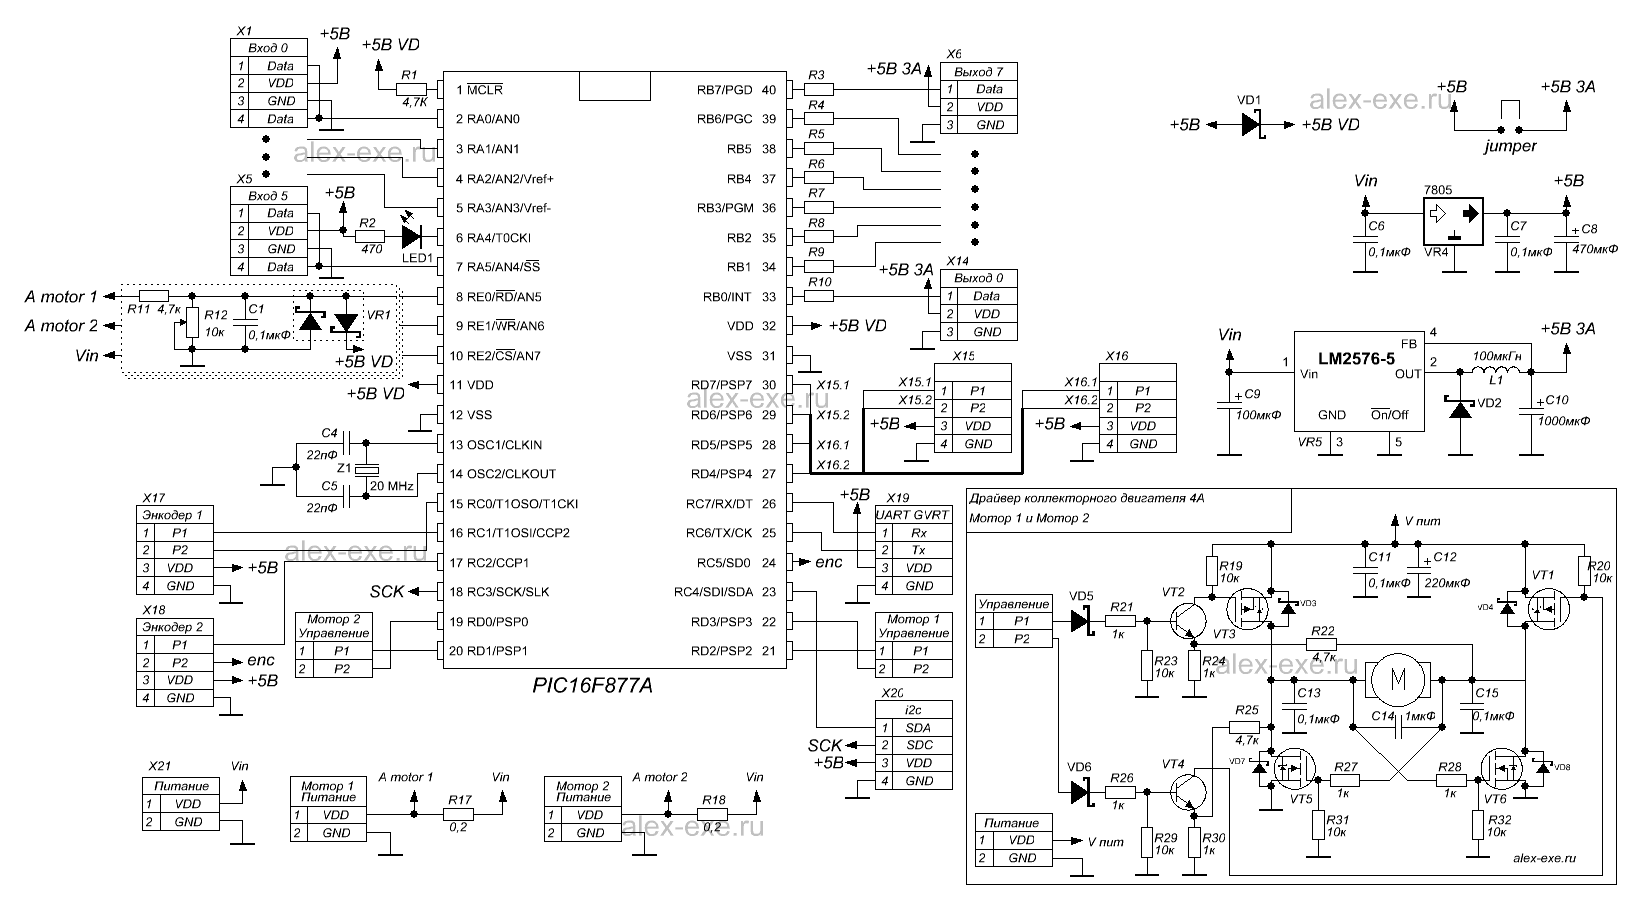 Stm32 схема двигатель